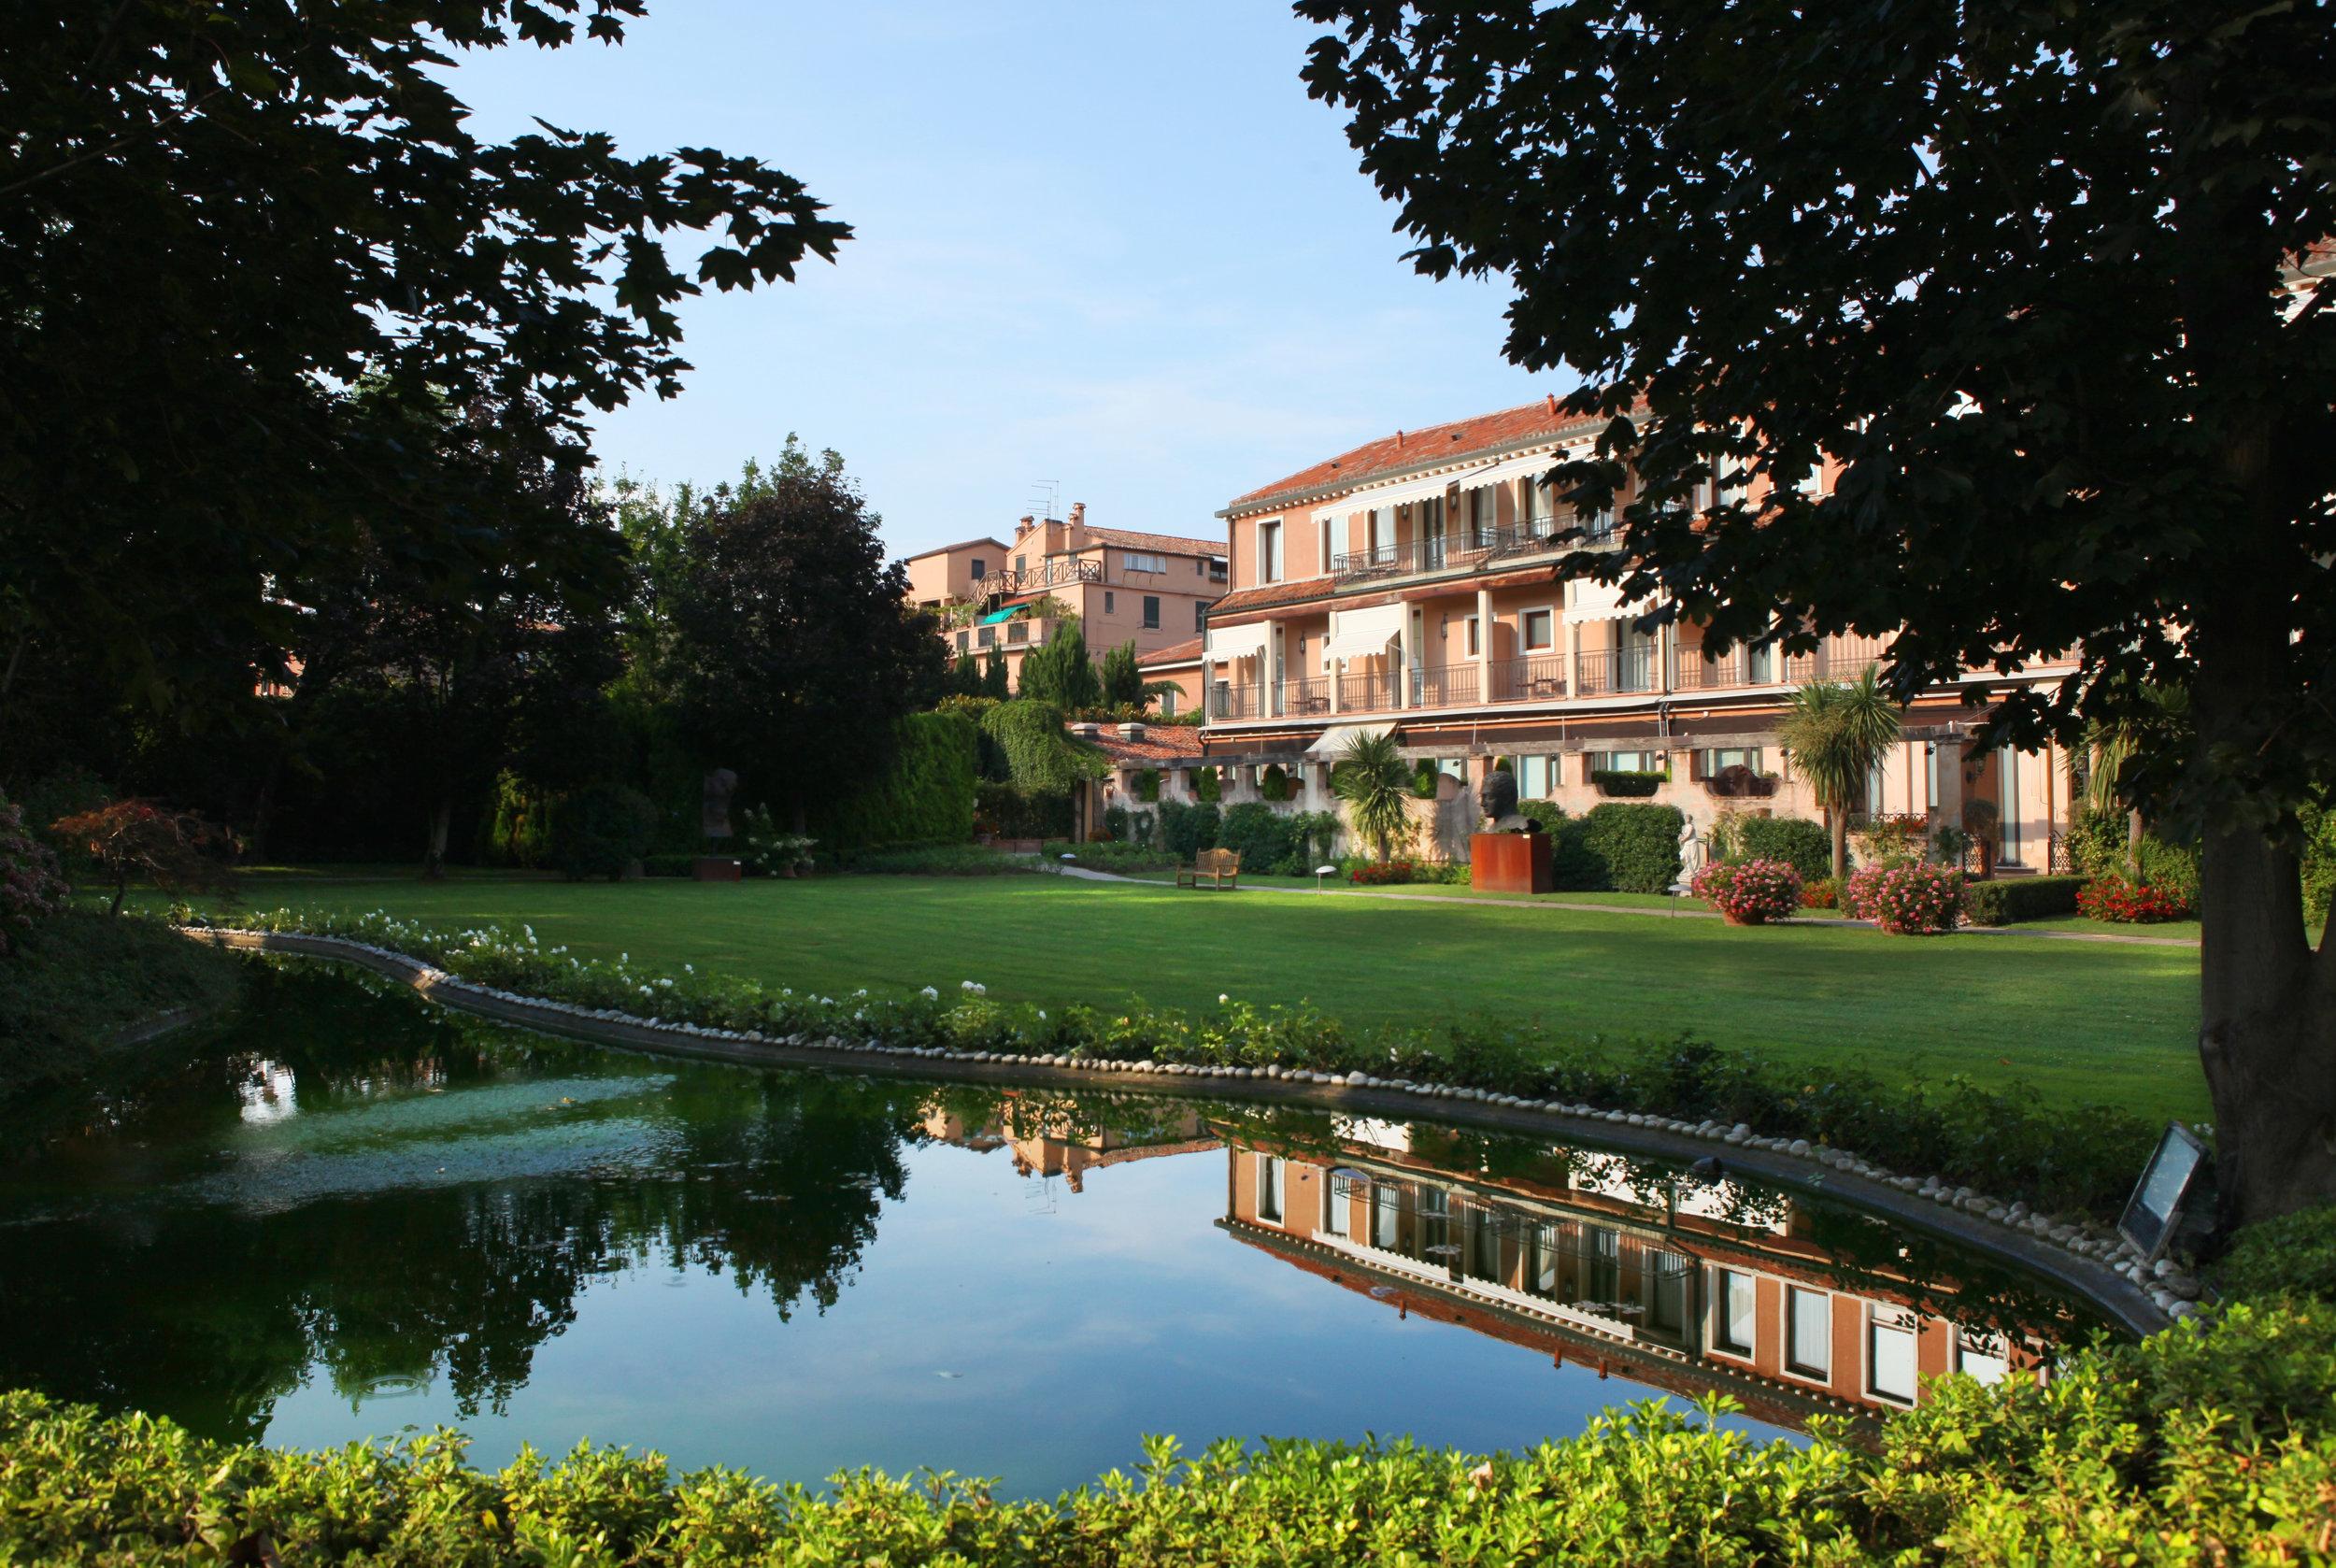 Belmond Hotel Cirpiani, Venice, Photo: Courtesy of Larkin Clark